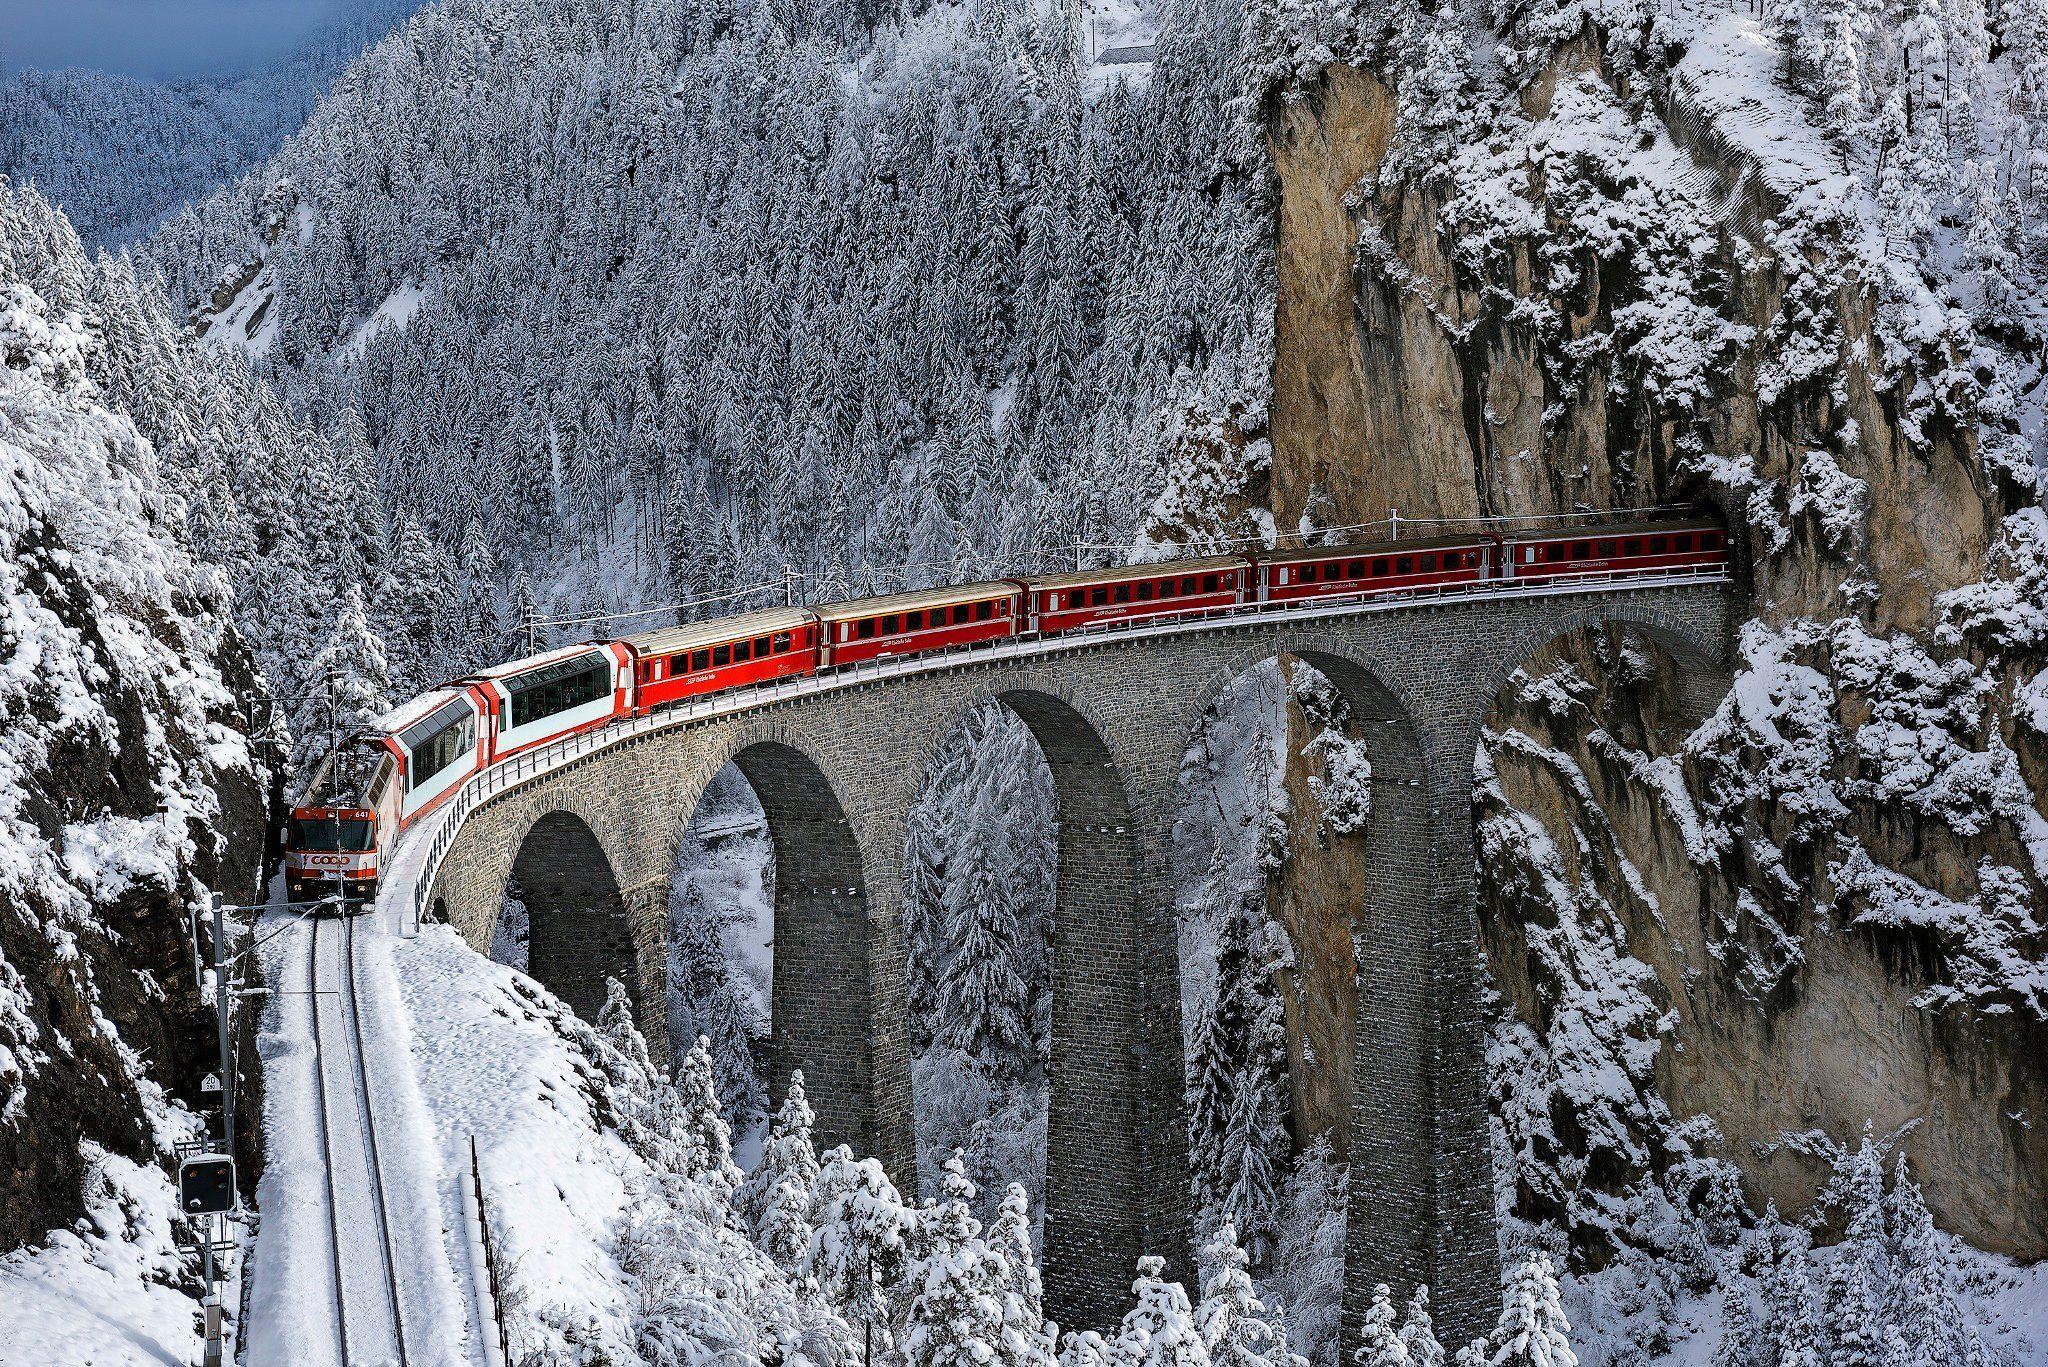 En iyi 10 tren rotası Seyahat, Tren